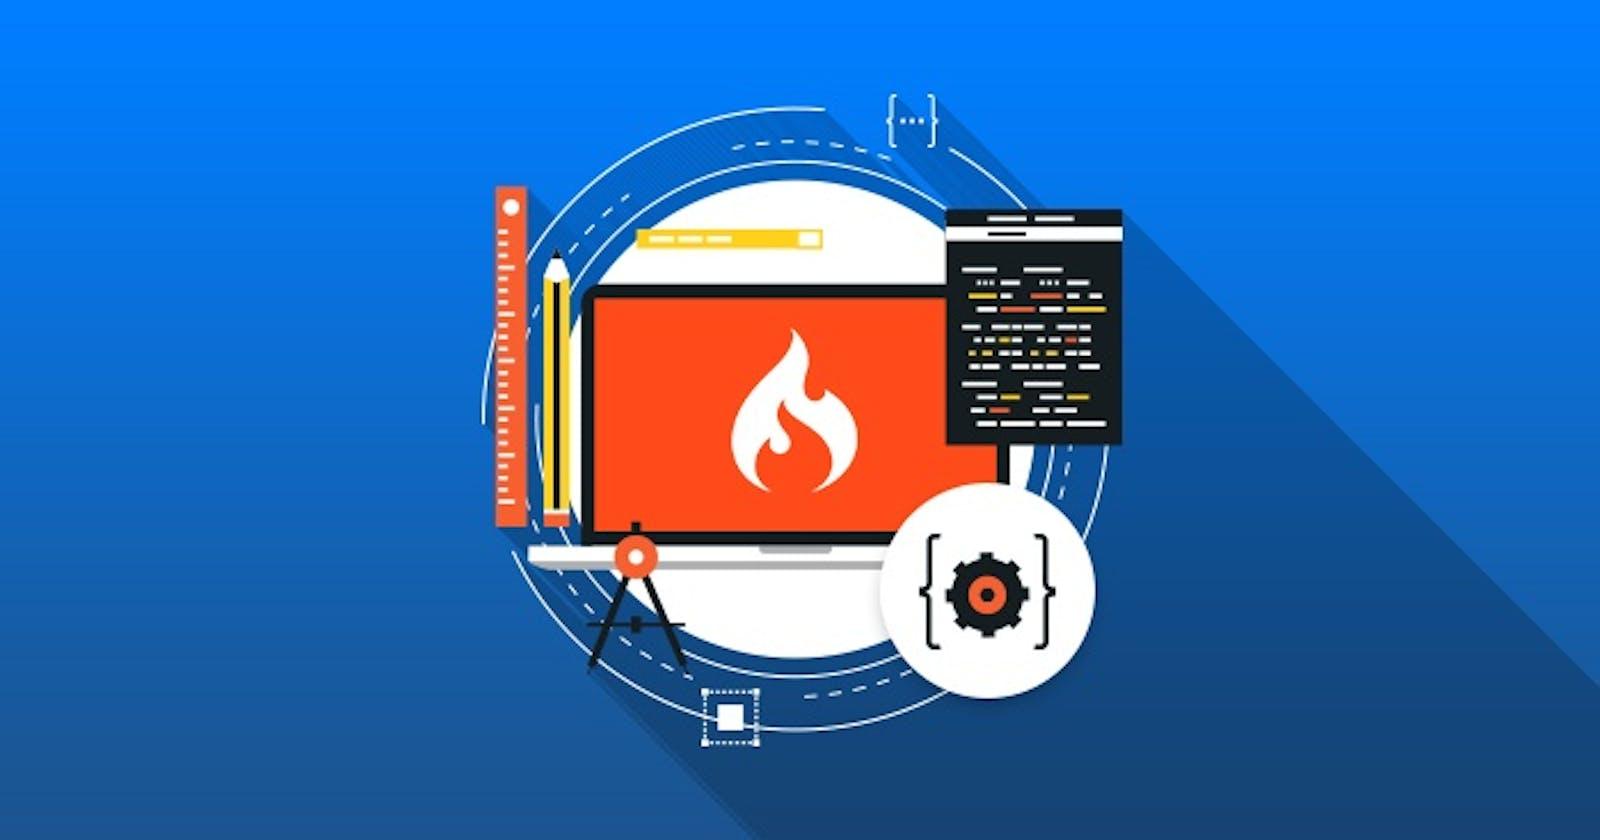 Building a simple API using Codeigniter 3